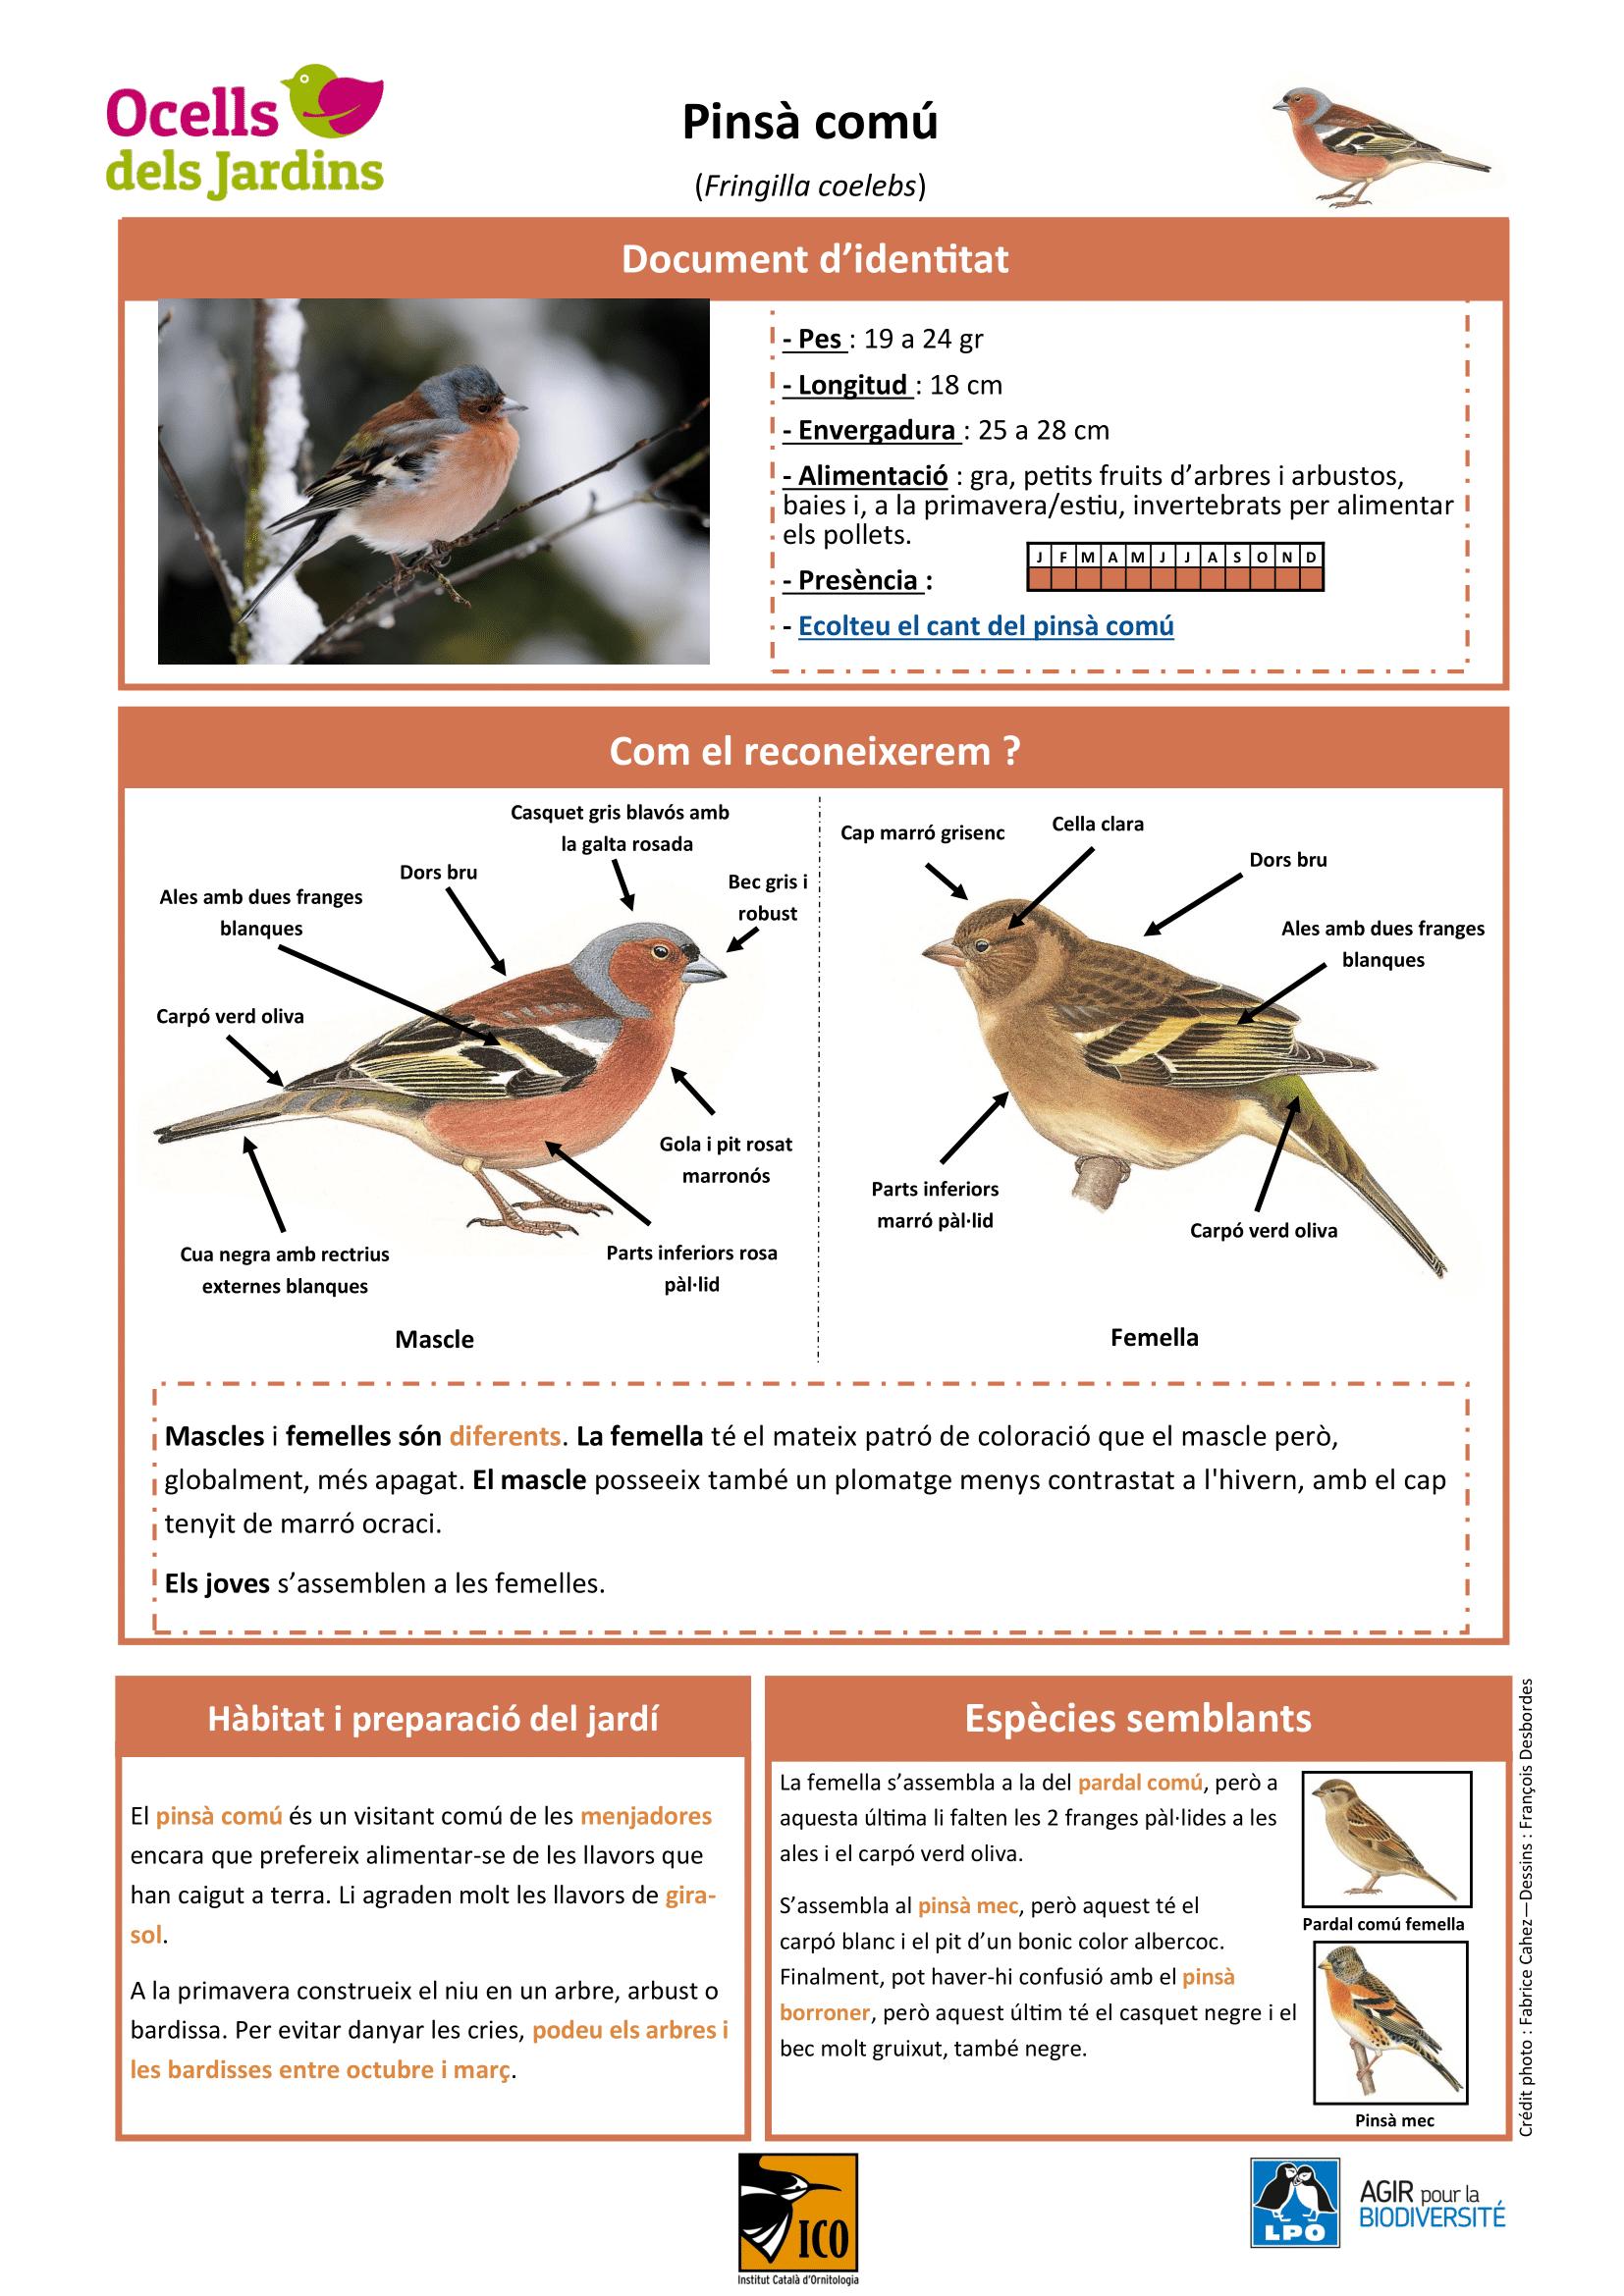 https://cdnfiles1.biolovision.net/www.ocellsdelsjardins.cat/userfiles/pinsacomu-1.png